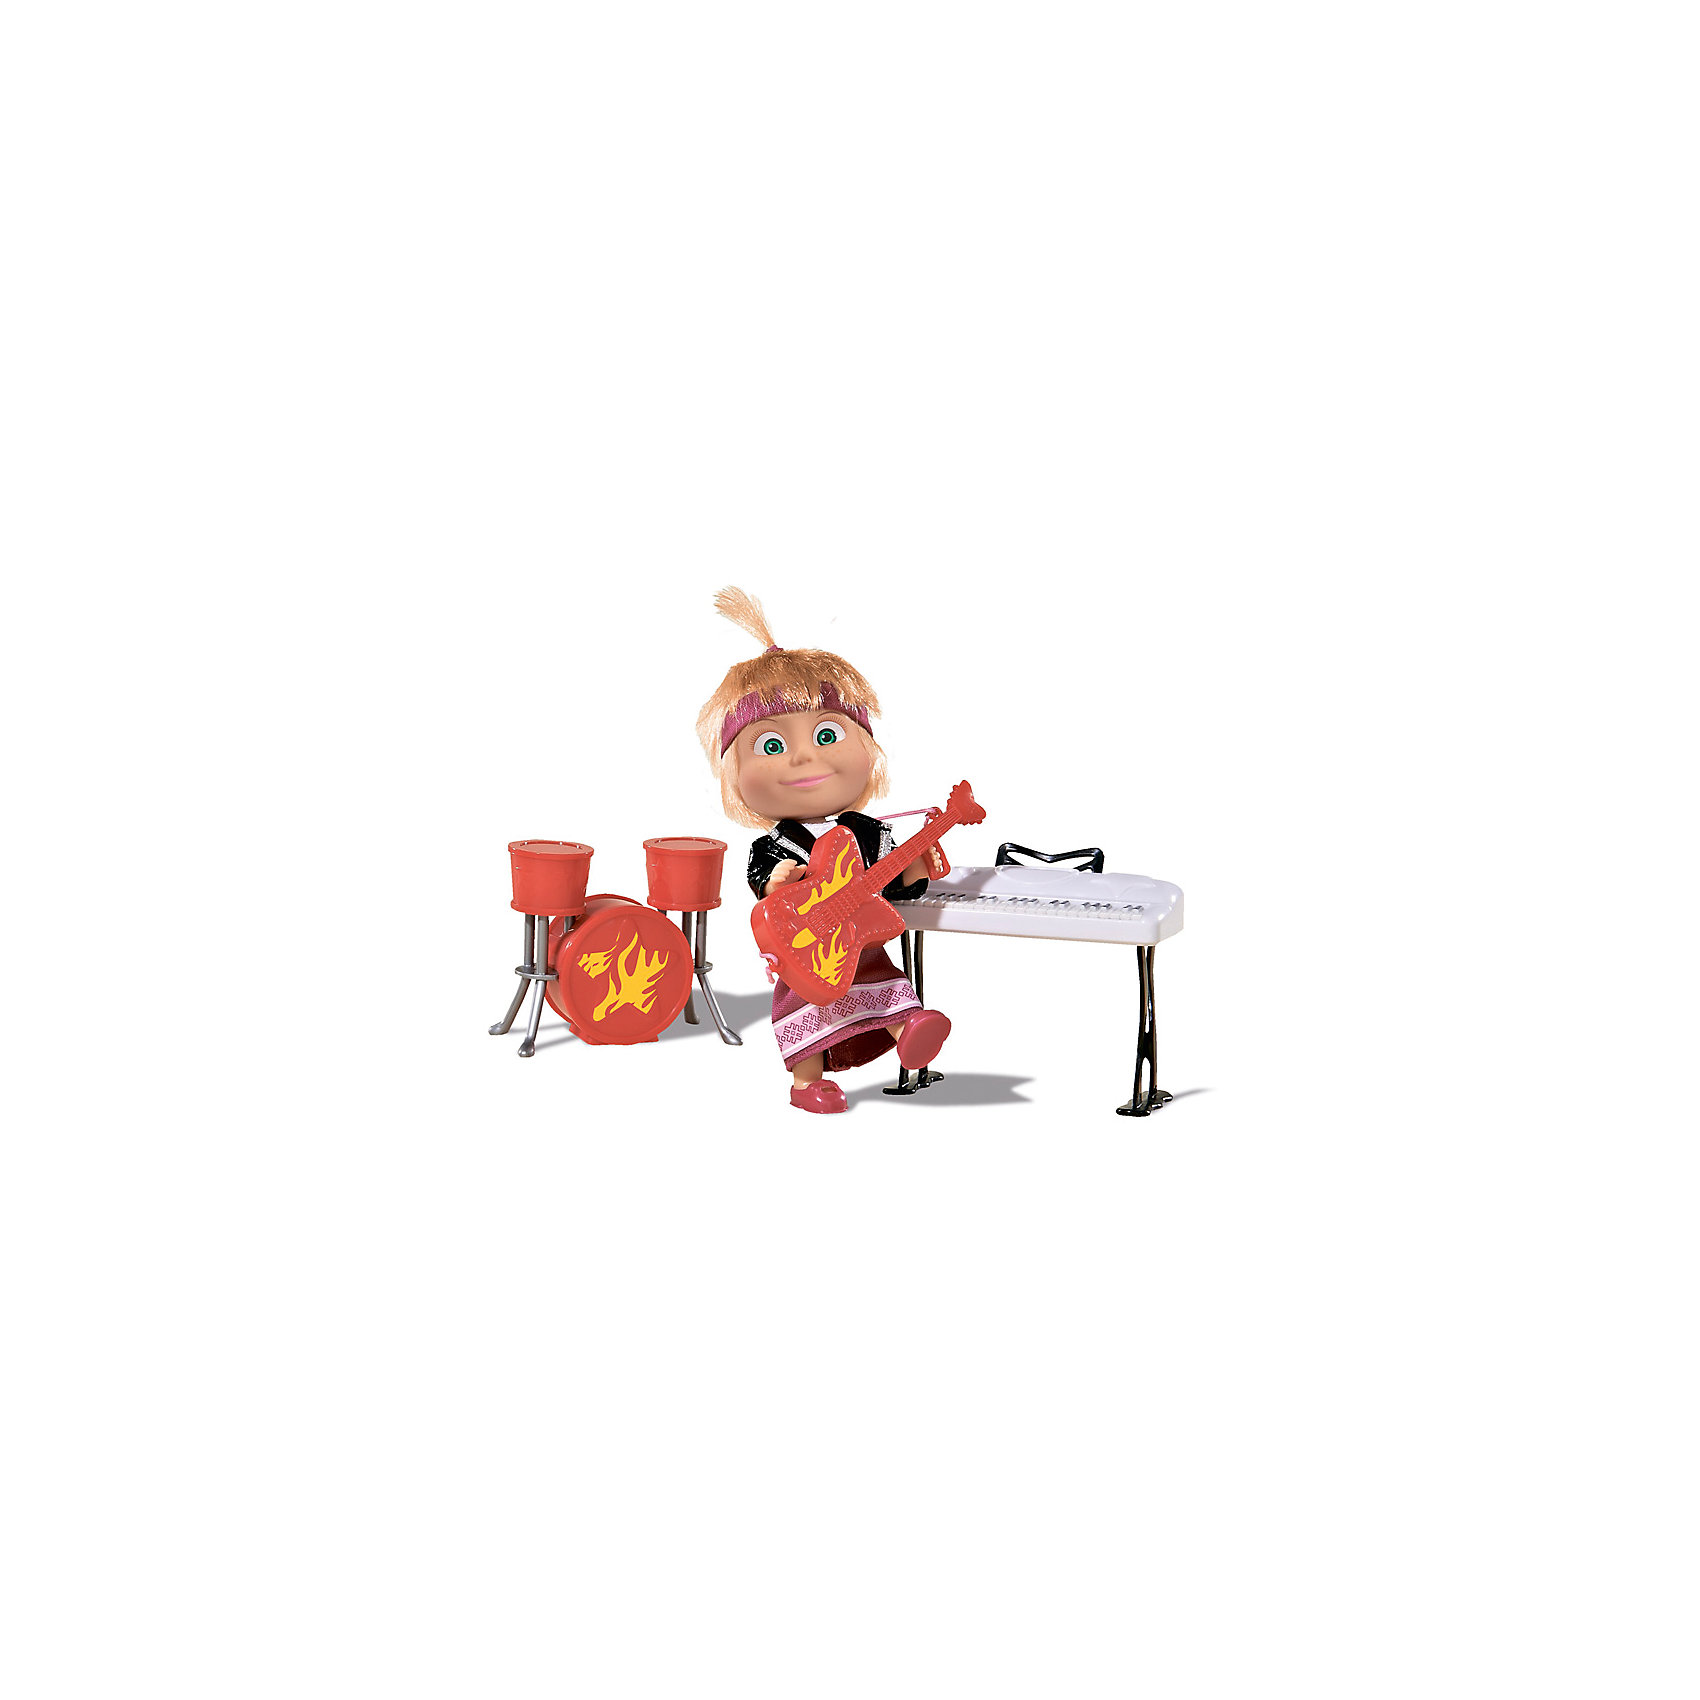 Simba Кукла Маша в рок-наряде, Маша и Медведь, Simba магниты маша и медведь купить игрушку